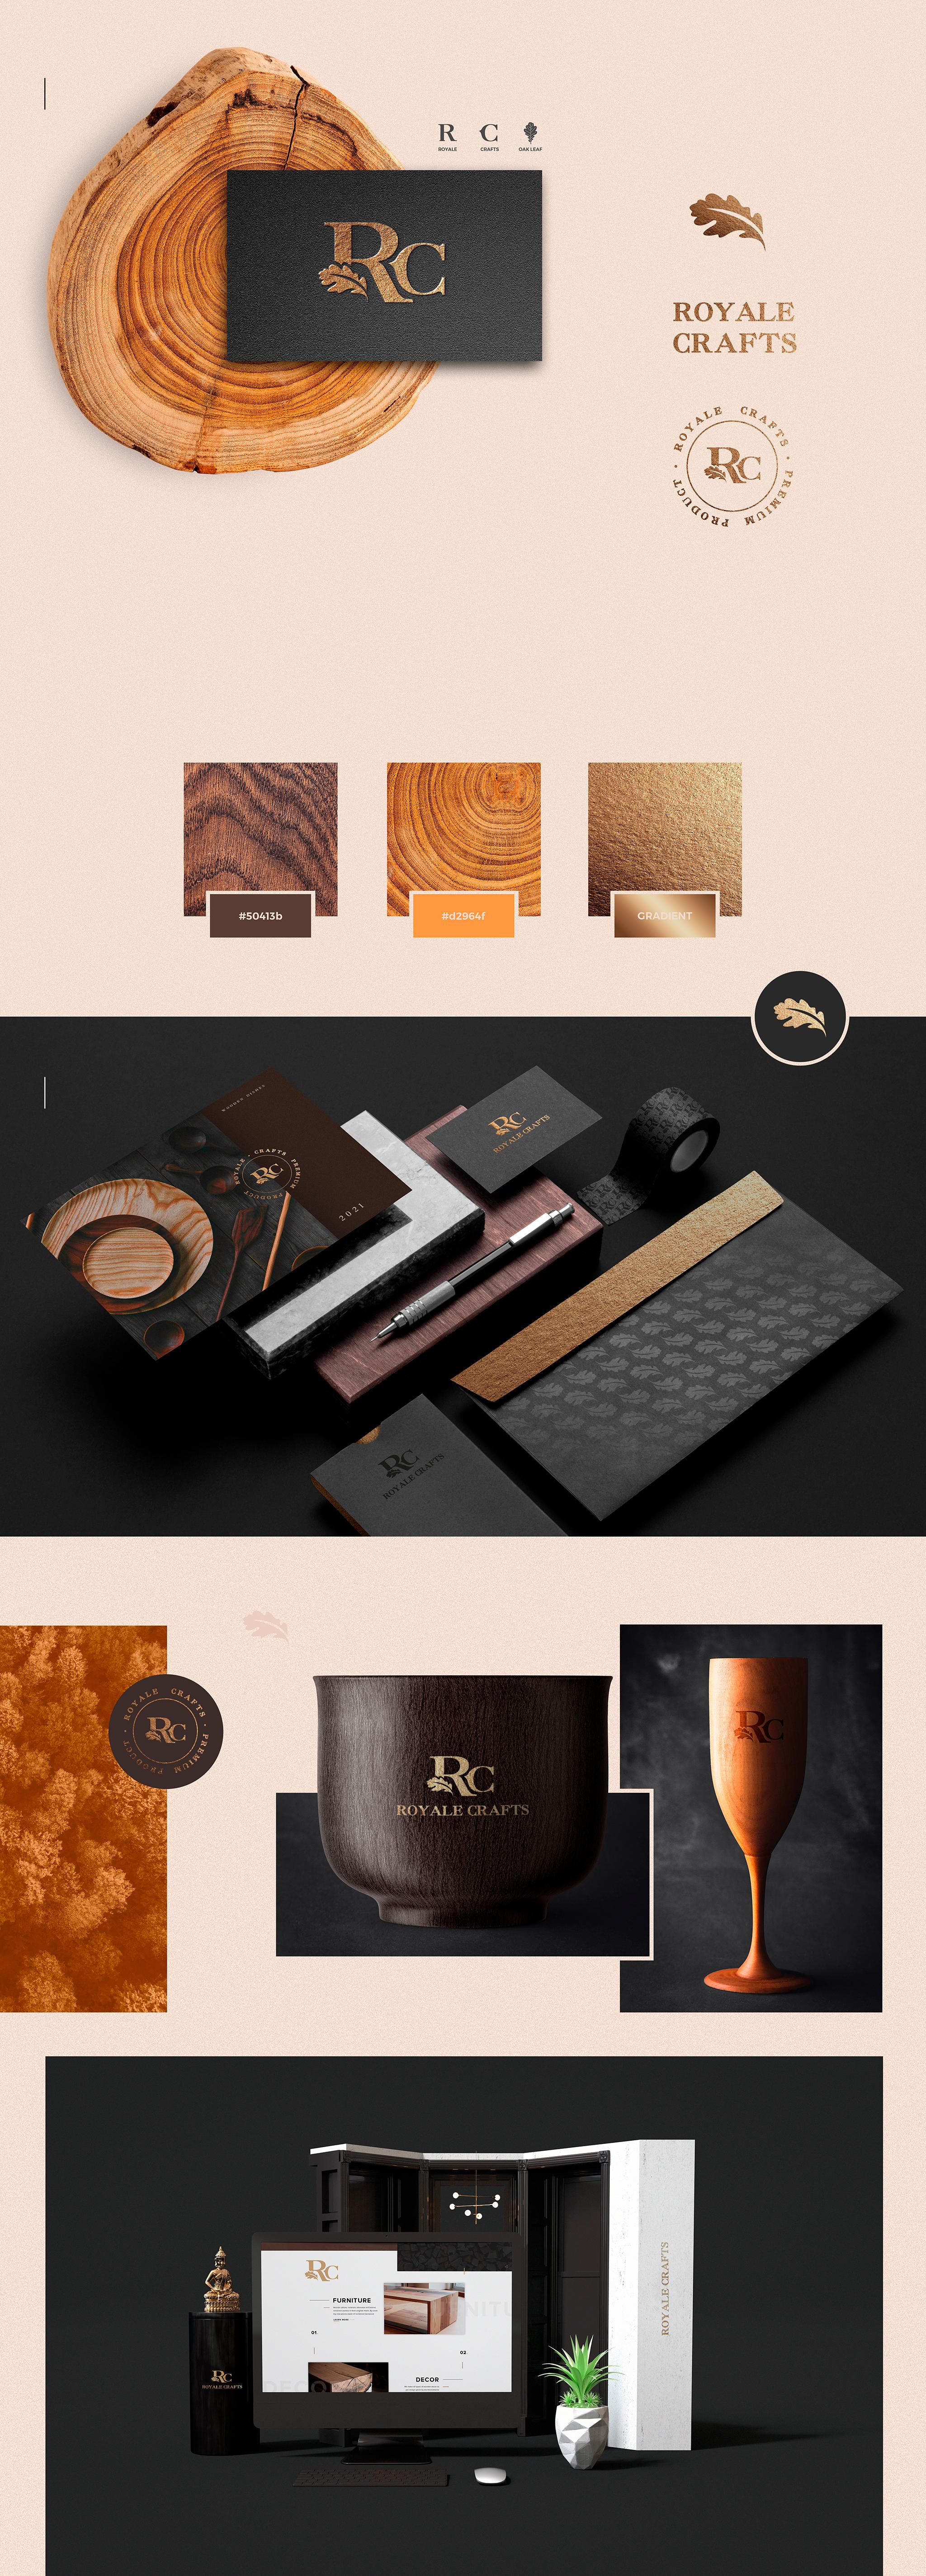 Royale Crafts   Order #1 Personal Branding   Branding Agency Branding